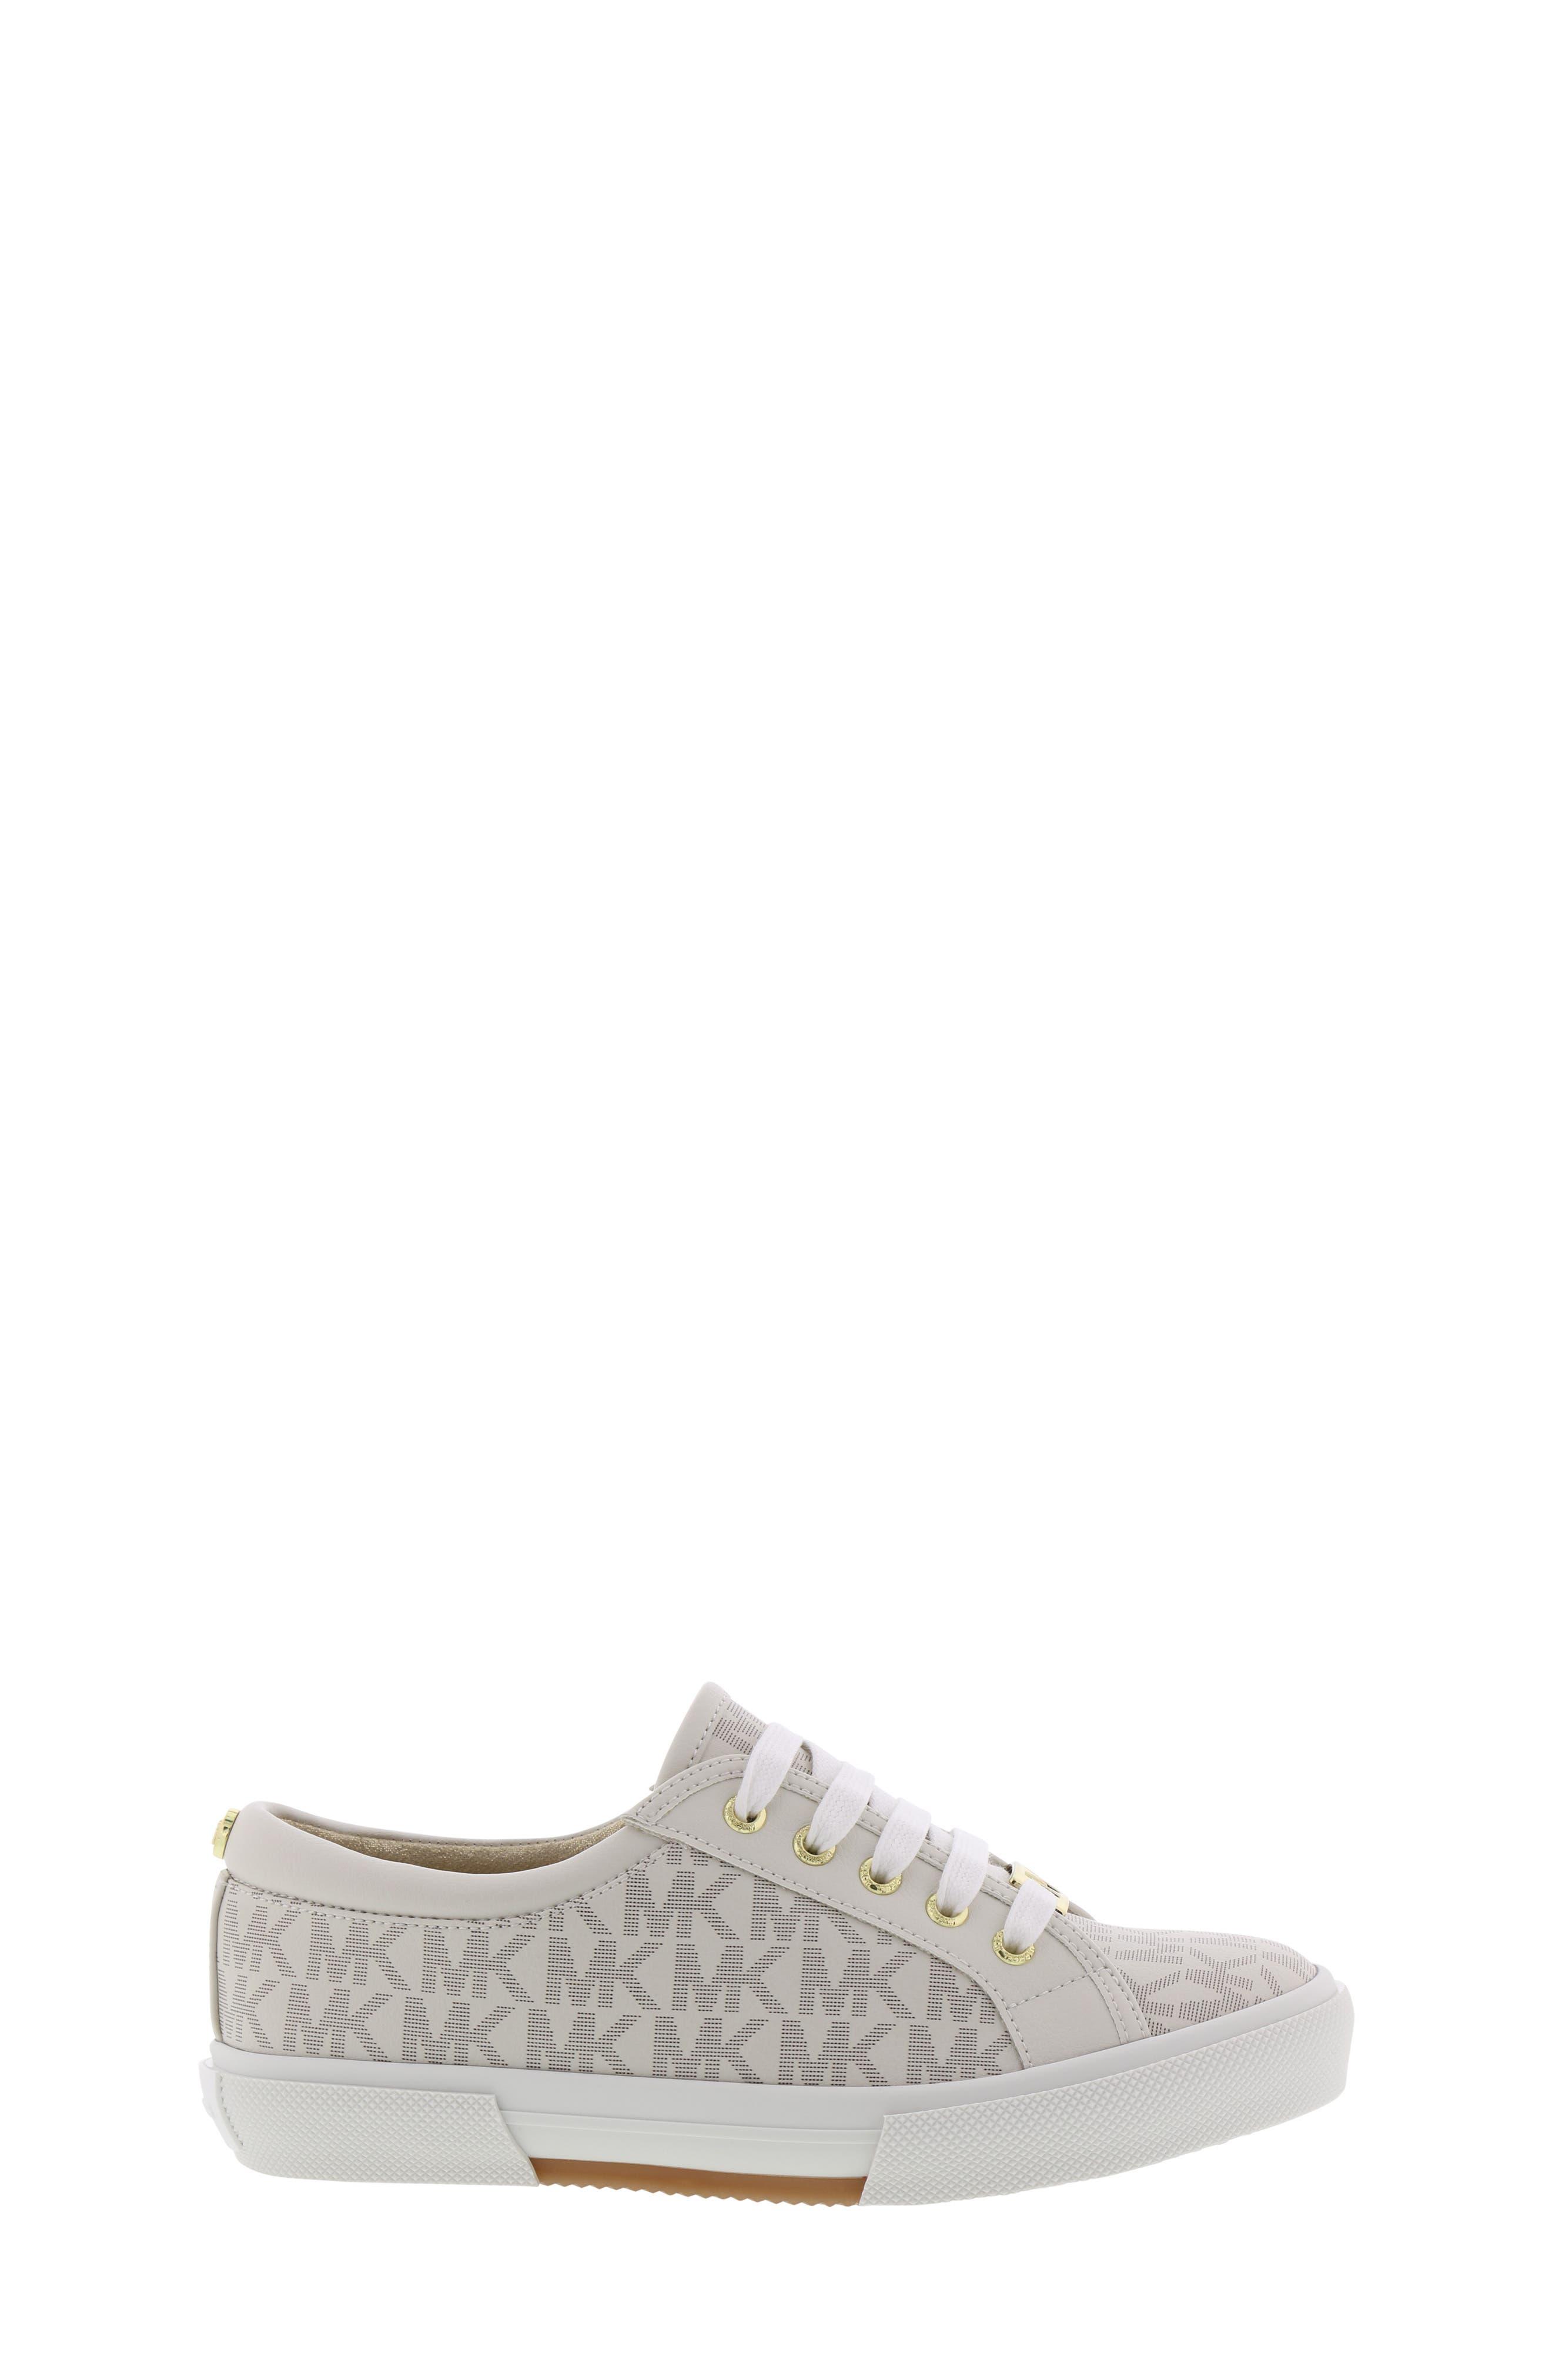 MICHAEL MICHAEL KORS, Ima Rebel Sneaker, Alternate thumbnail 3, color, VANILLA